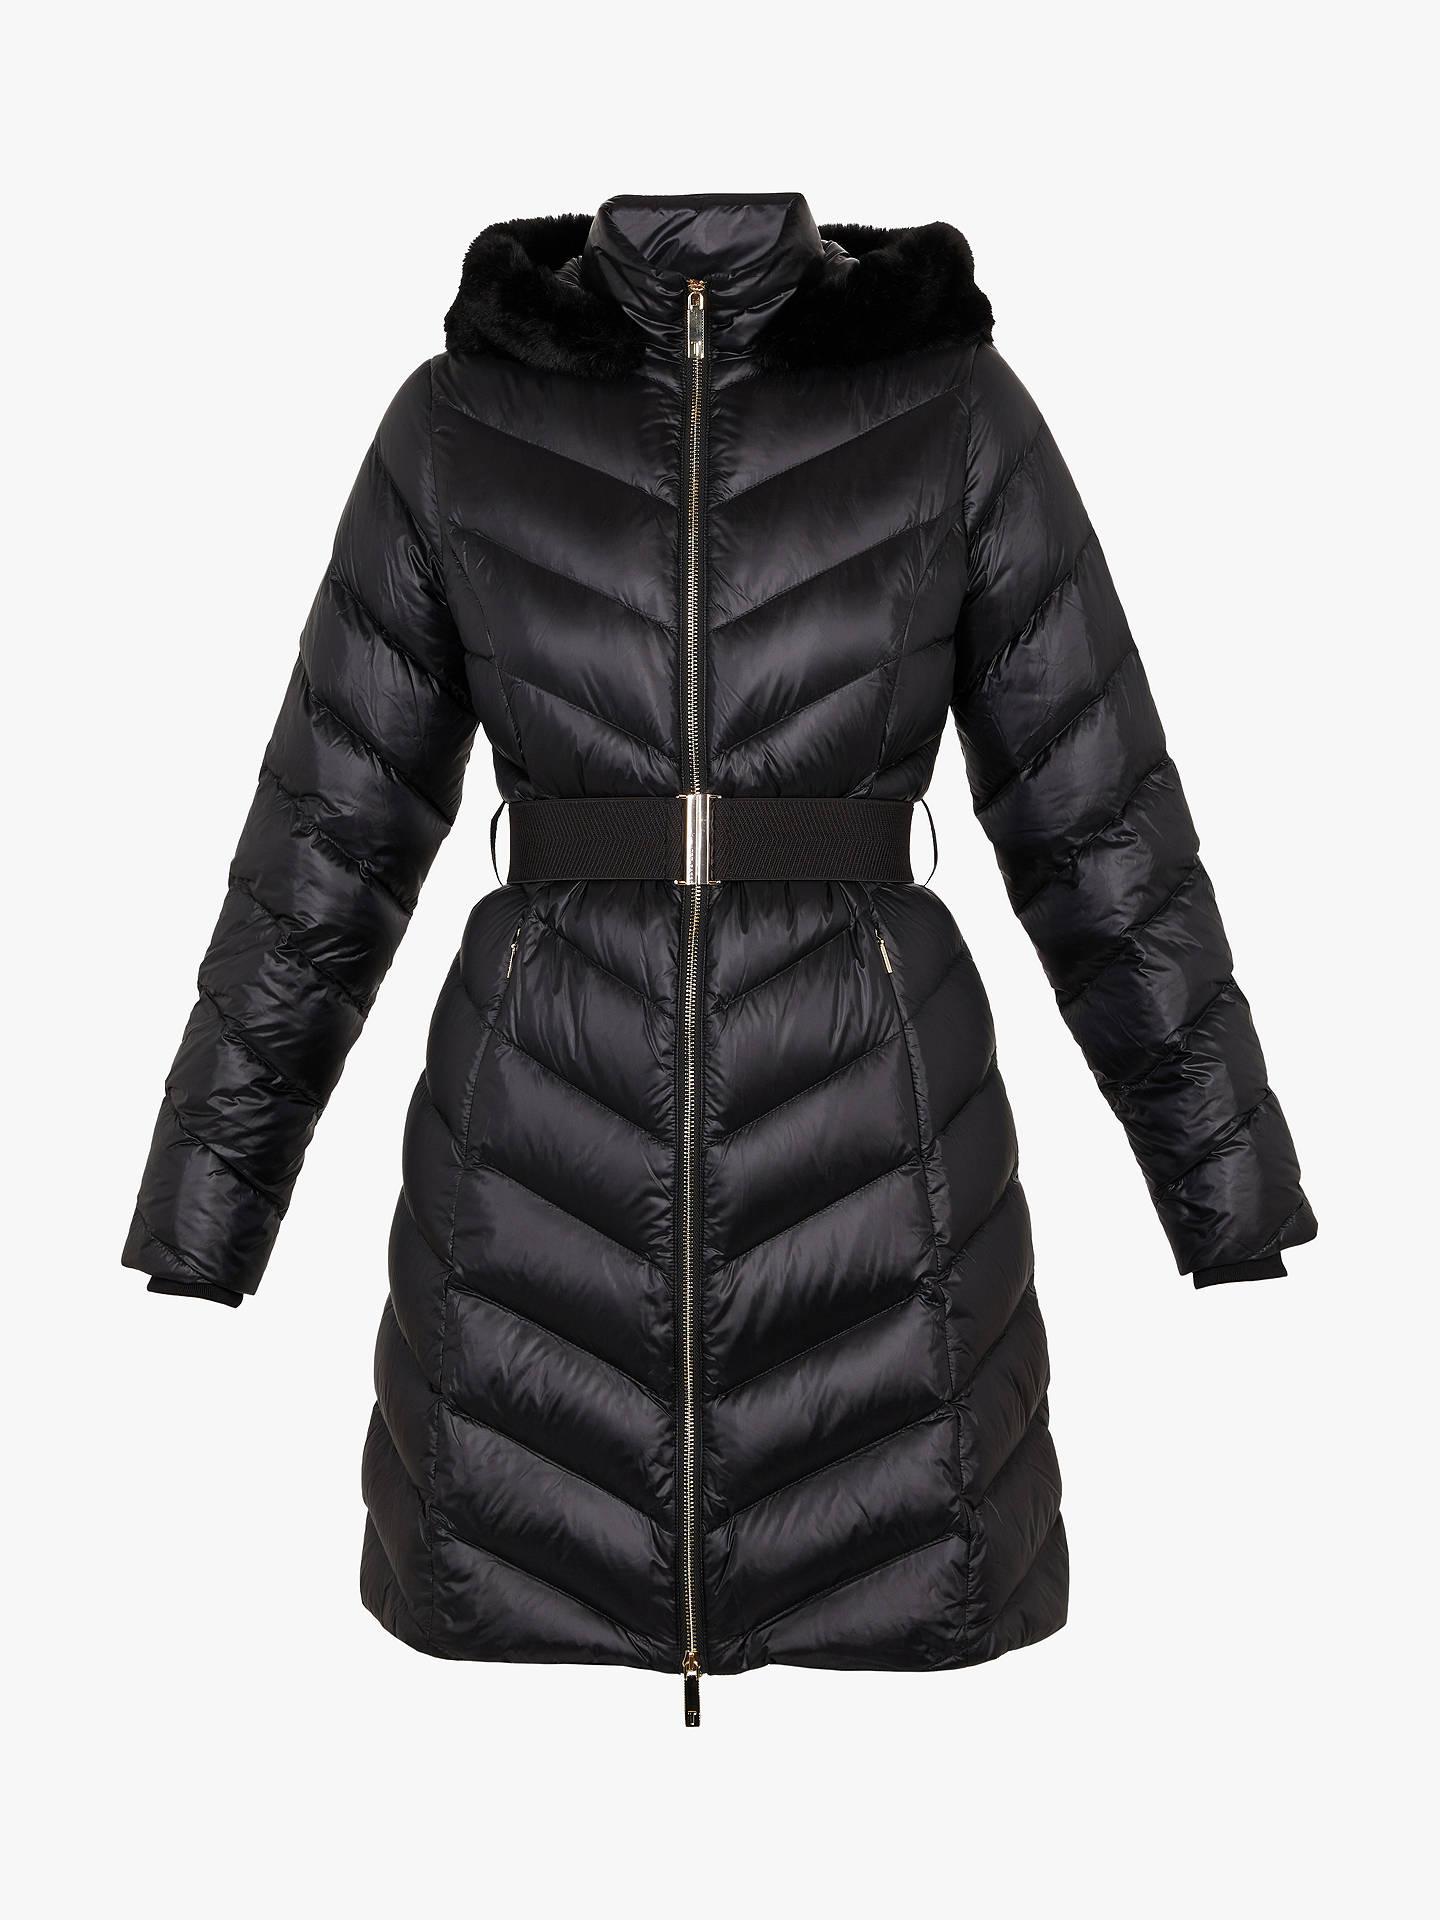 064c45dadf12 Buy Ted Baker Millsa Chevron Long Puffer Jacket, Black, S Online at  johnlewis.